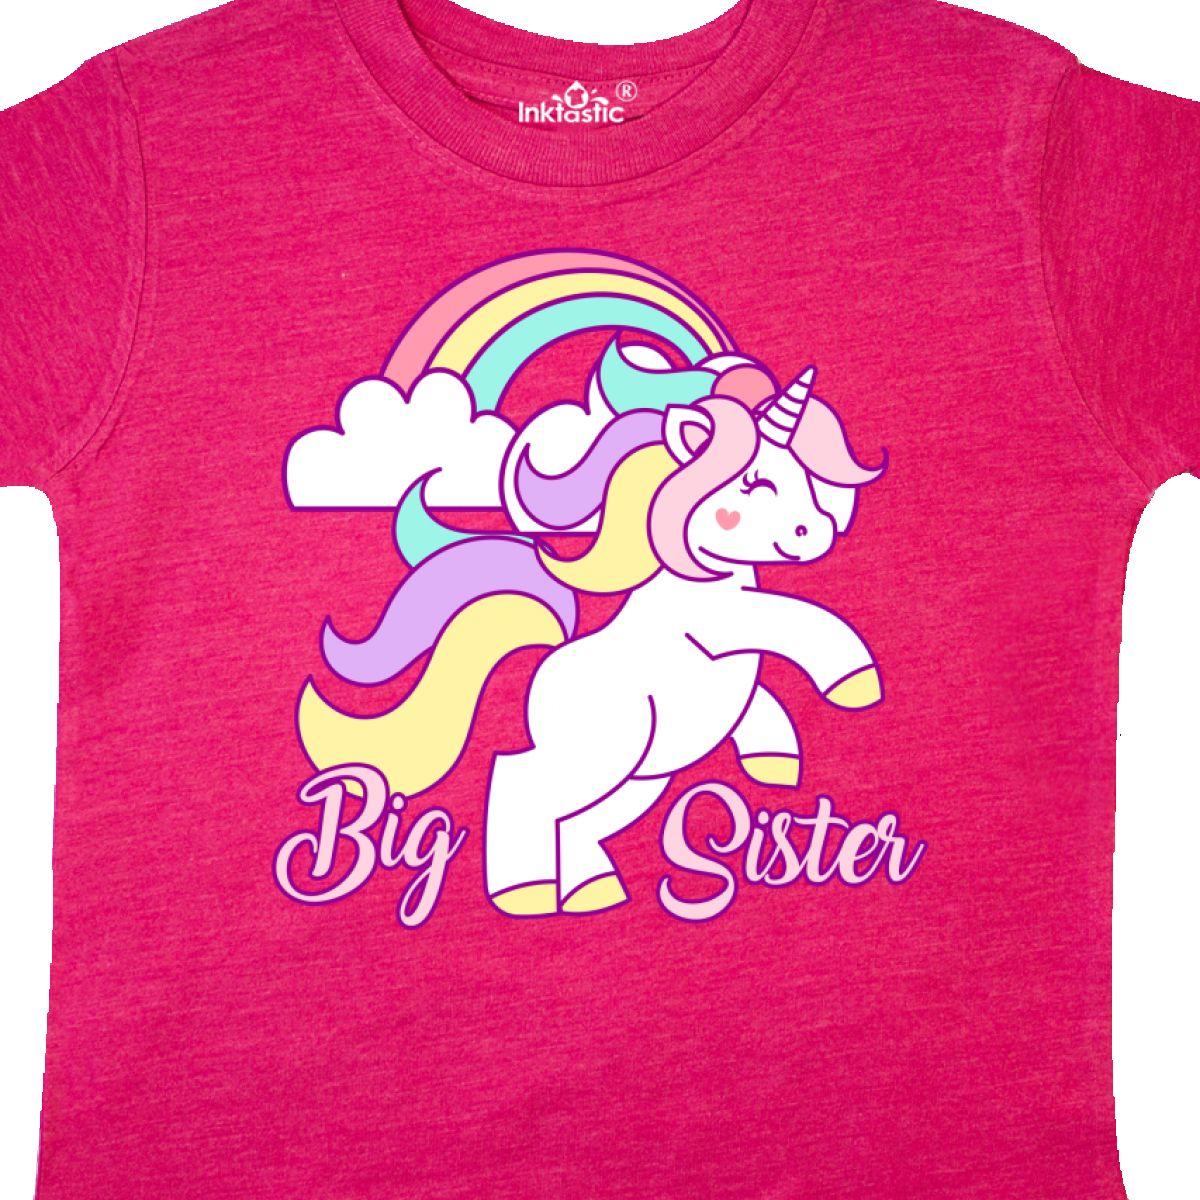 Inktastic-Big-Sister-Unicorn-Toddler-T-Shirt-Fantasy-Happy-Child-Preschooler-Kid thumbnail 14